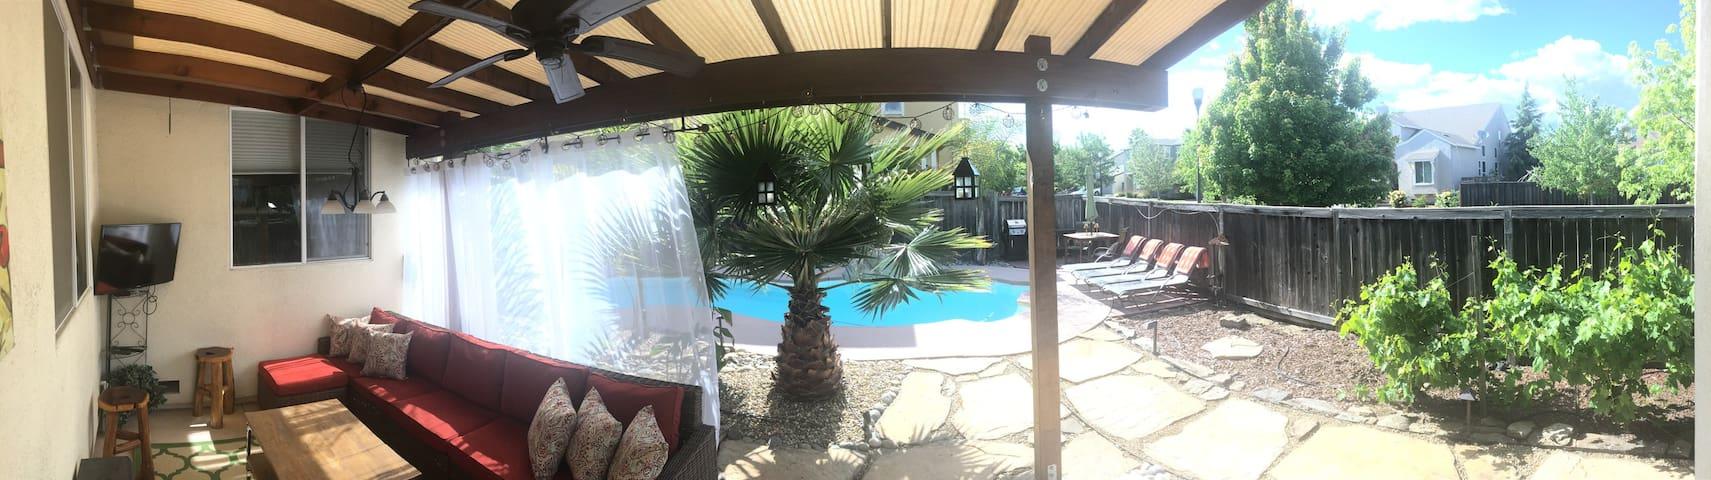 Private backyard retreat!